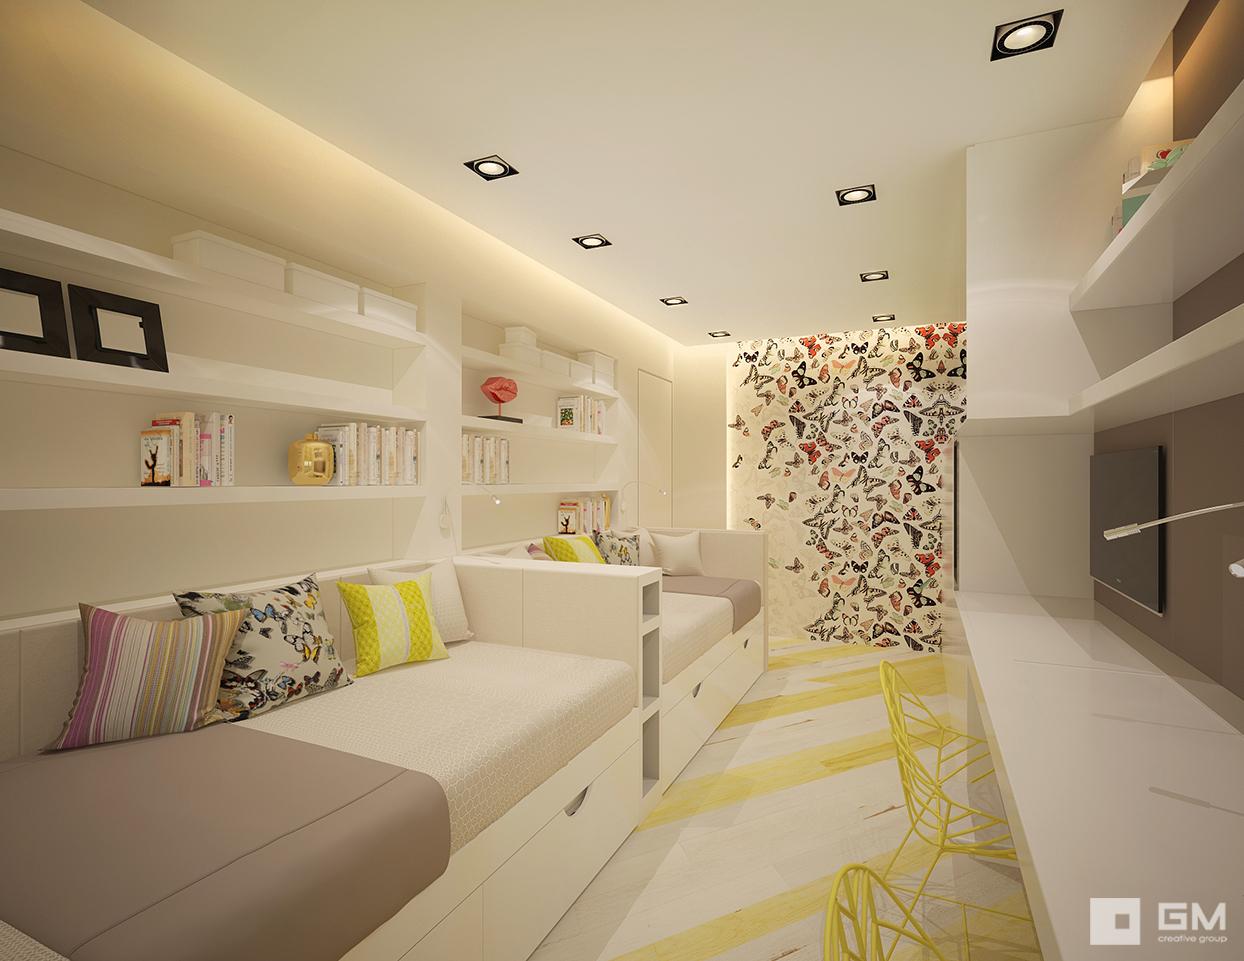 Дизайн трехкомнатной квартиры от студии дизайна GM-INTERIOR